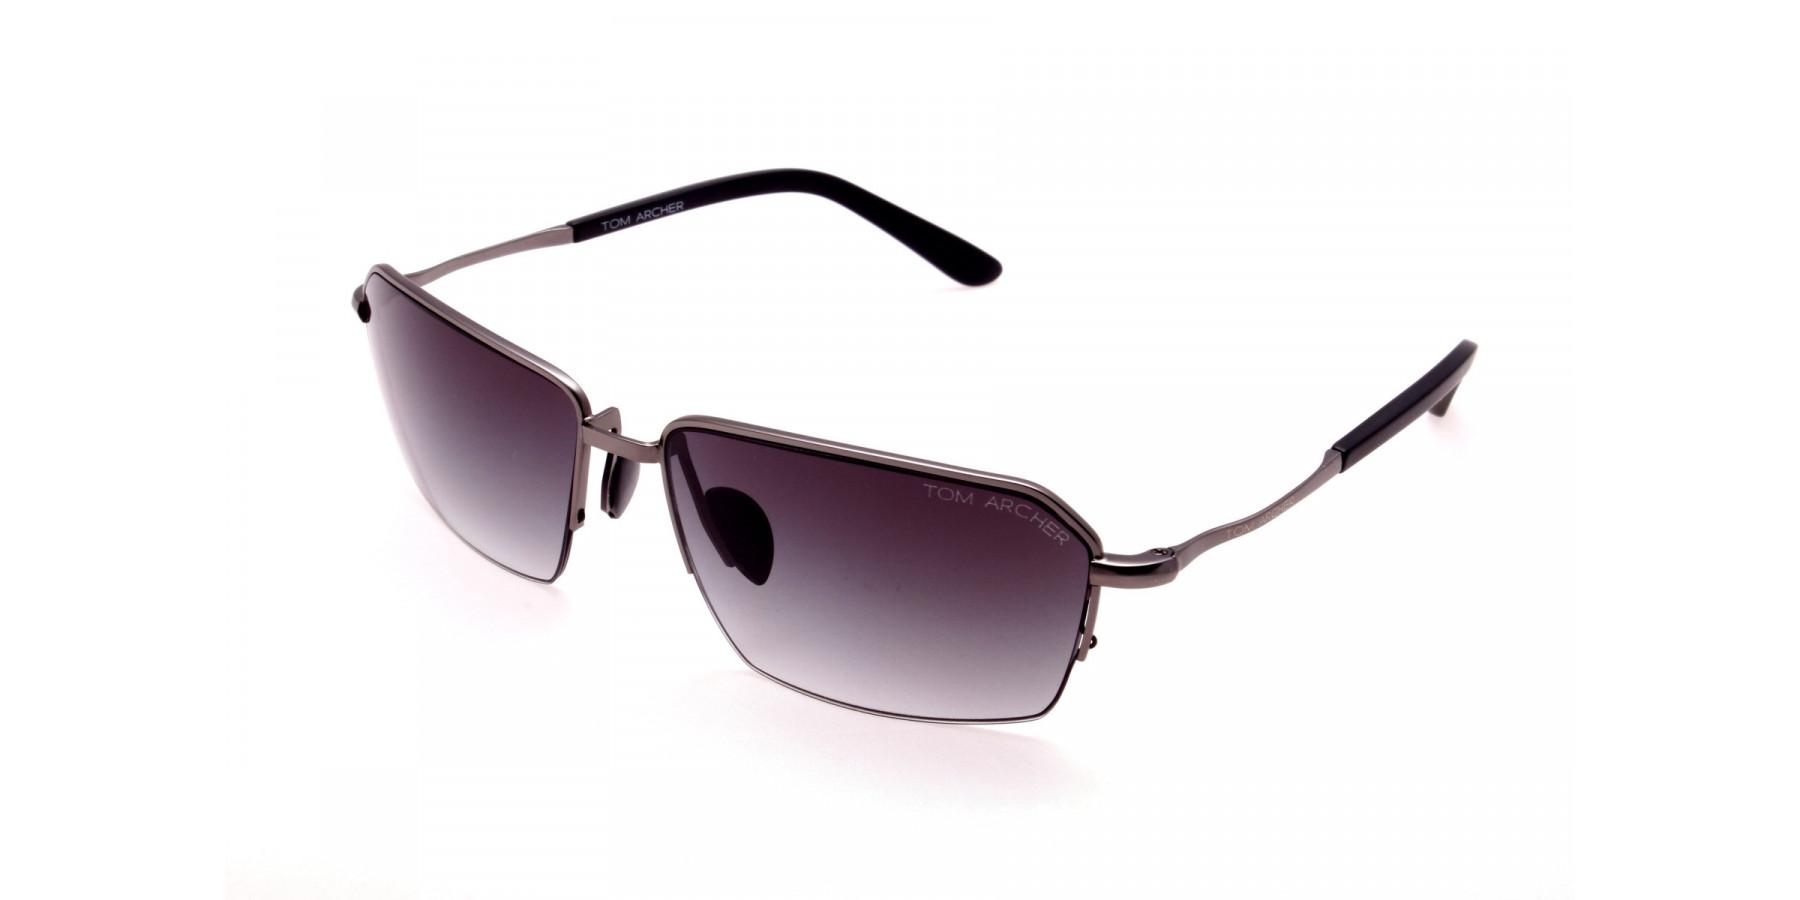 Cool Gunmetal Sunglasses in Half Rimmed Design - 2